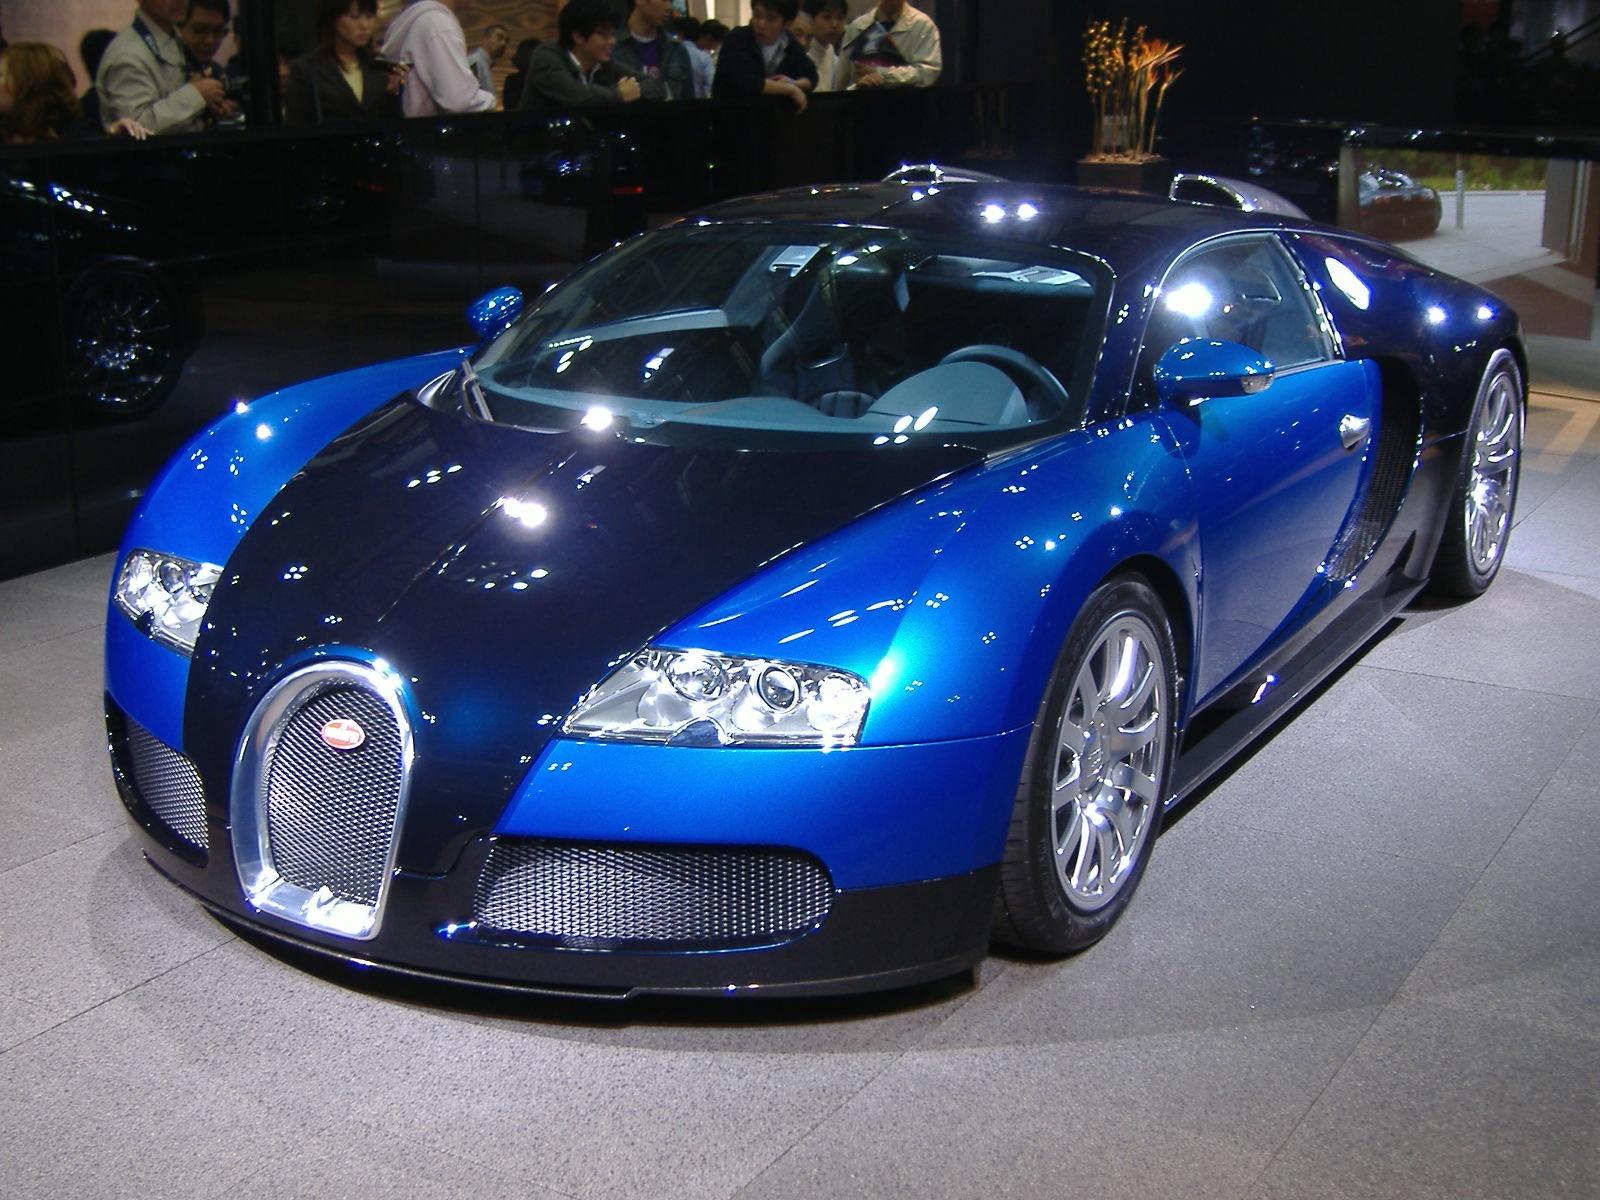 http://3.bp.blogspot.com/-gHcPild7M7E/T846lYmfImI/AAAAAAAAFpQ/6pWuM7nNjxA/s1600/wallpaper-carros-tunados-papeis-de-parede+(1).jpg